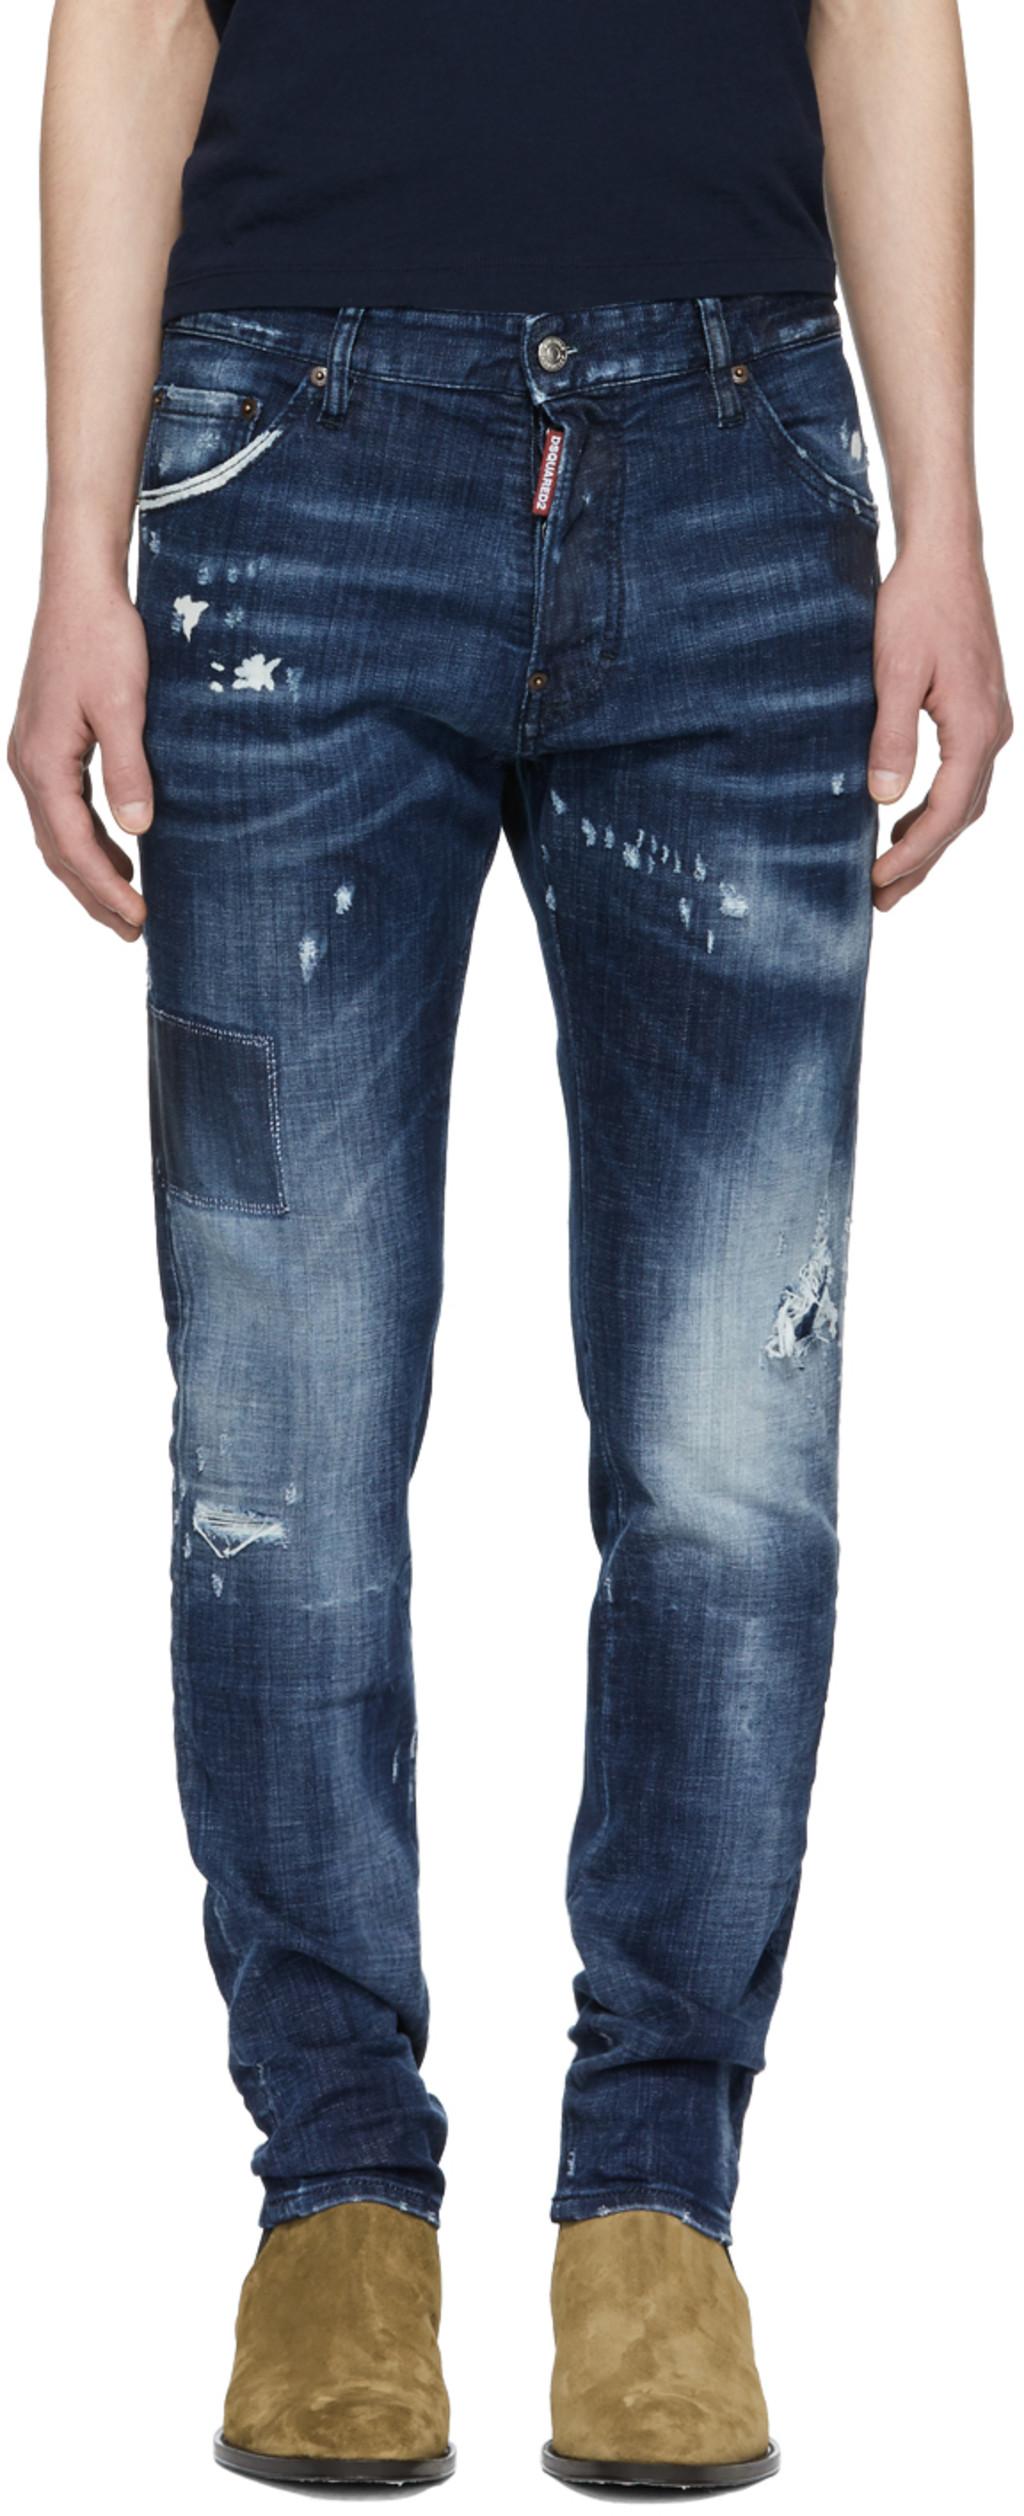 Maigres Dan Jeans - Bleu Dsquared2 0UIwDQ4OGP